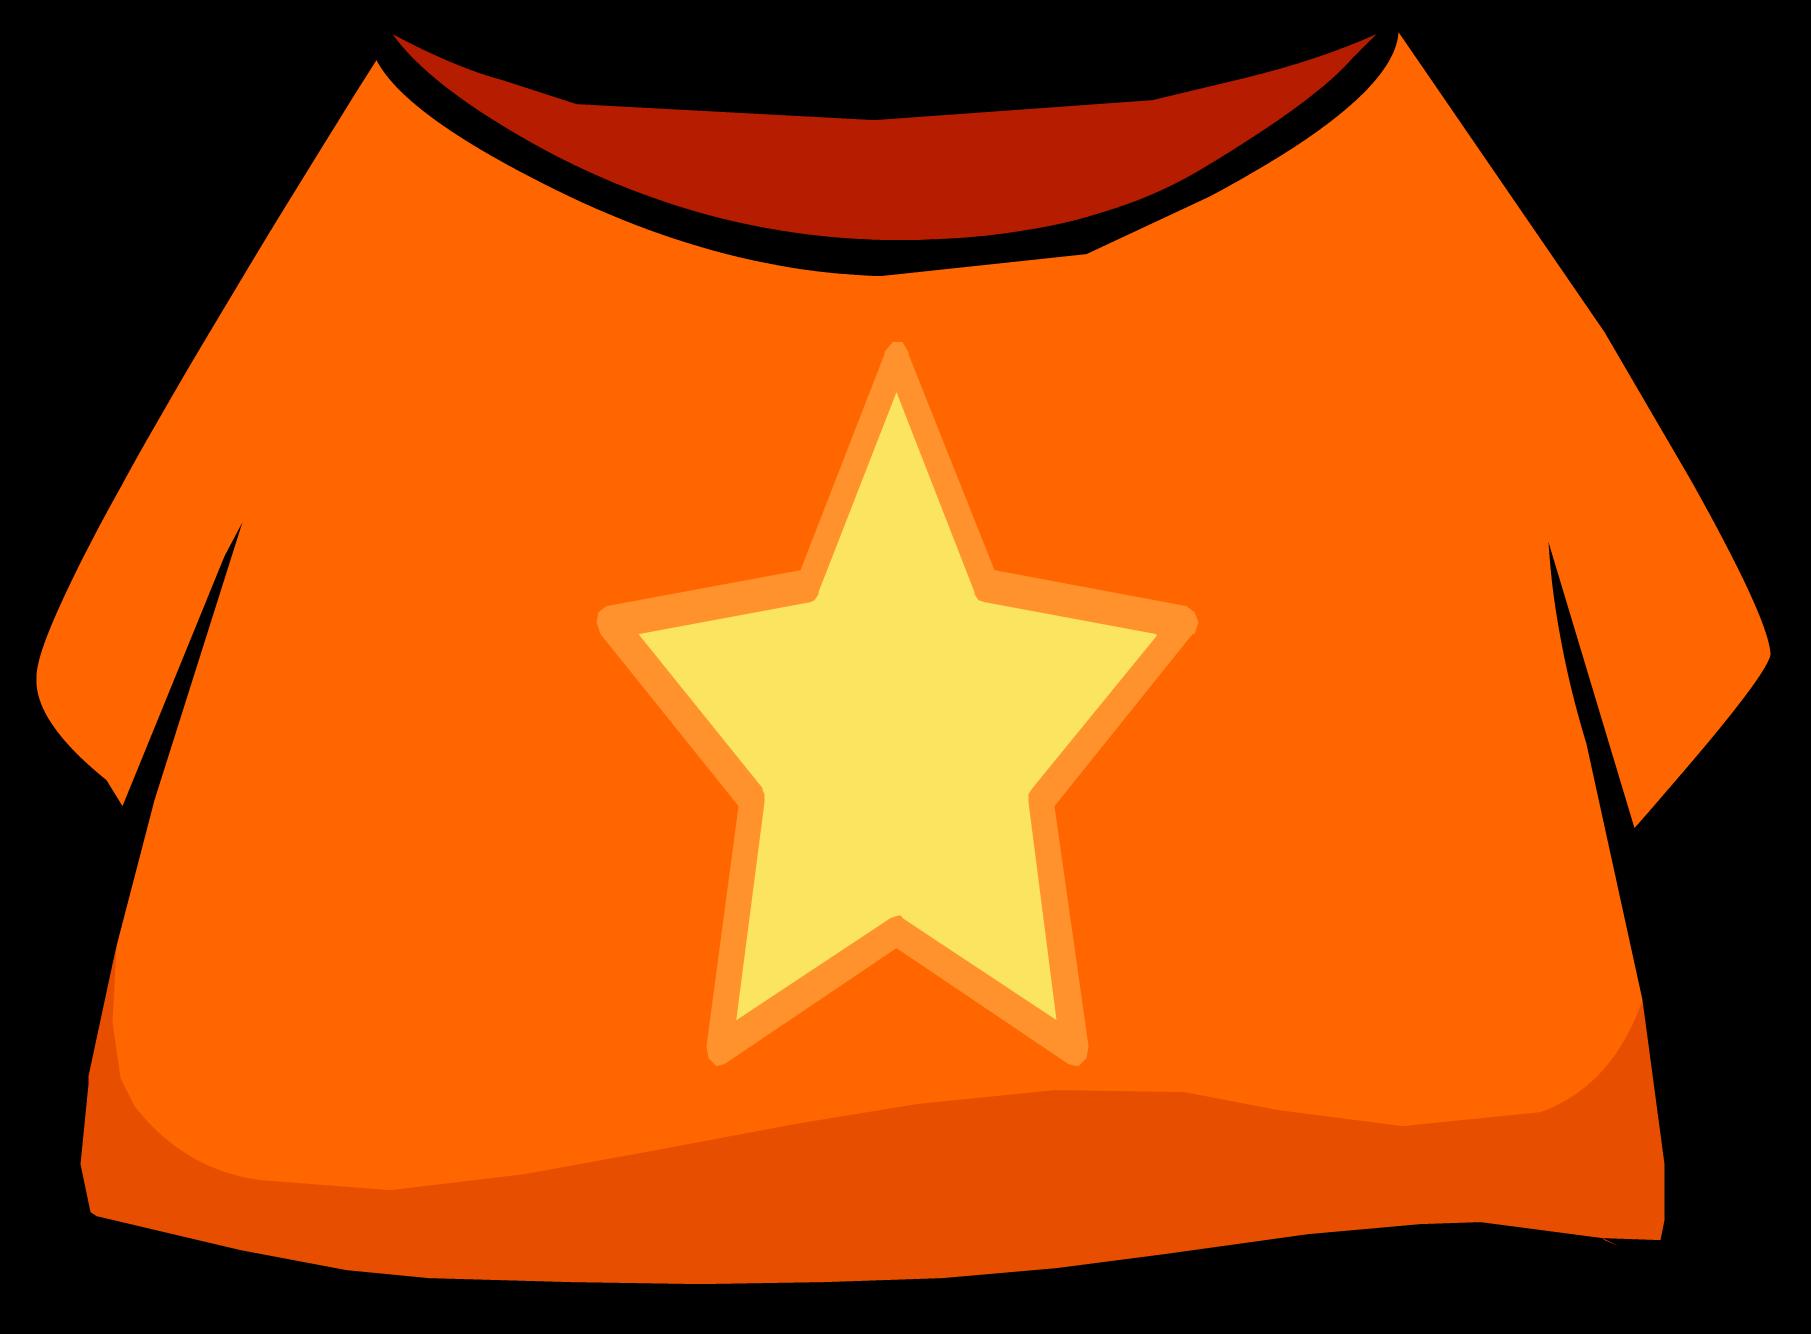 Star t club penguin. Clipart shirt orange shirt